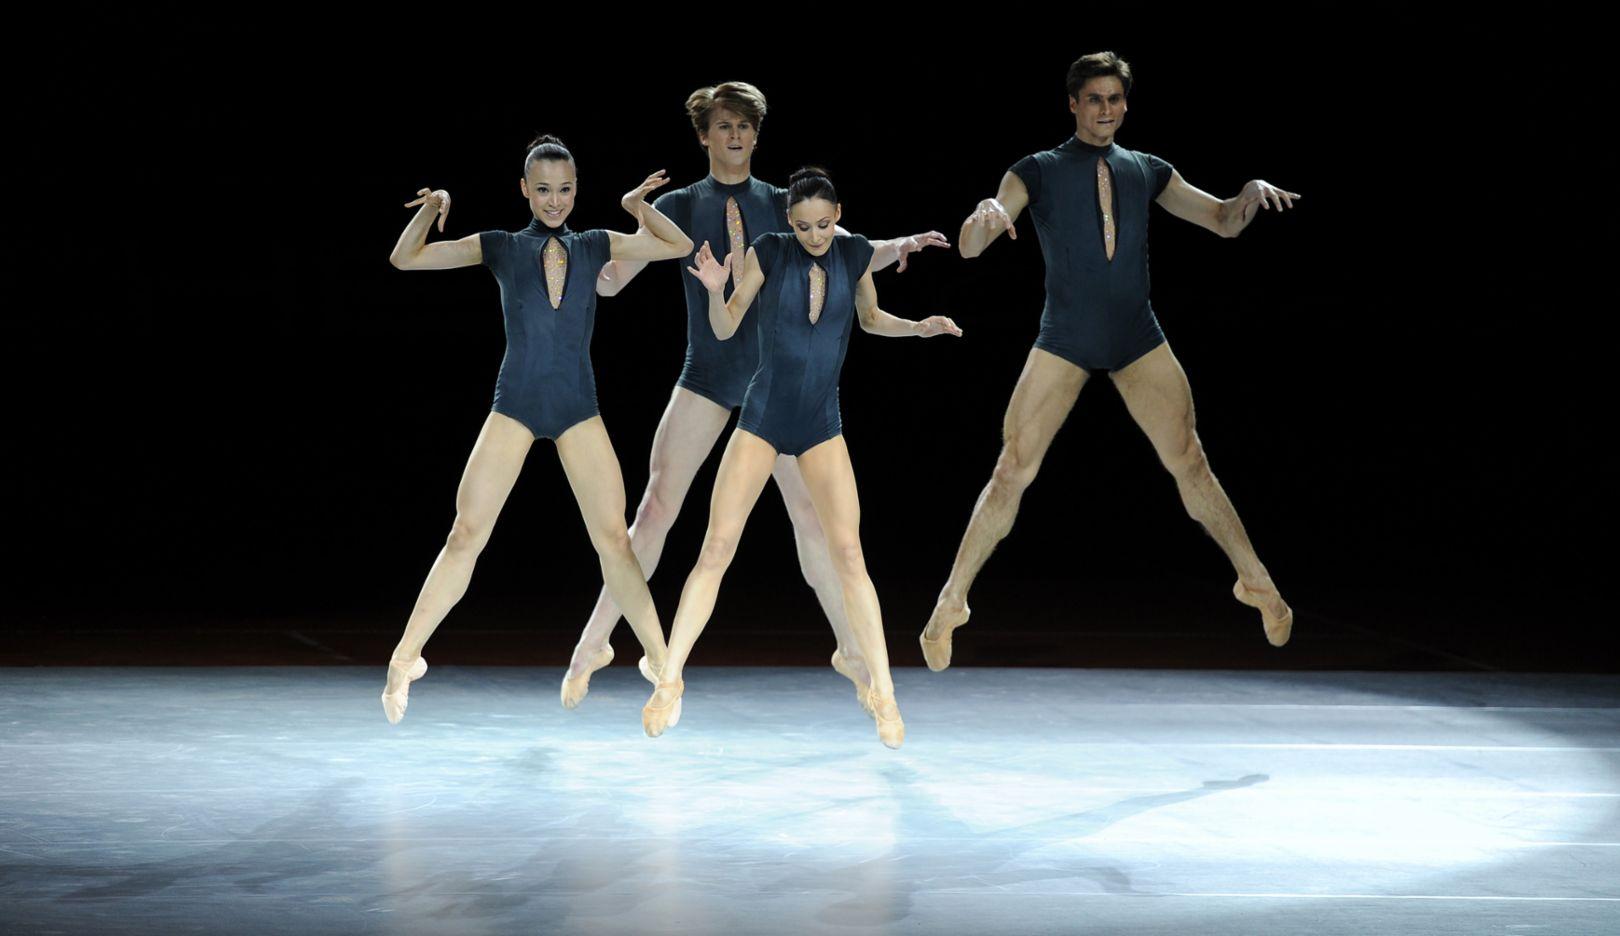 Stuttgarter Ballett, 2012, Porsche AG